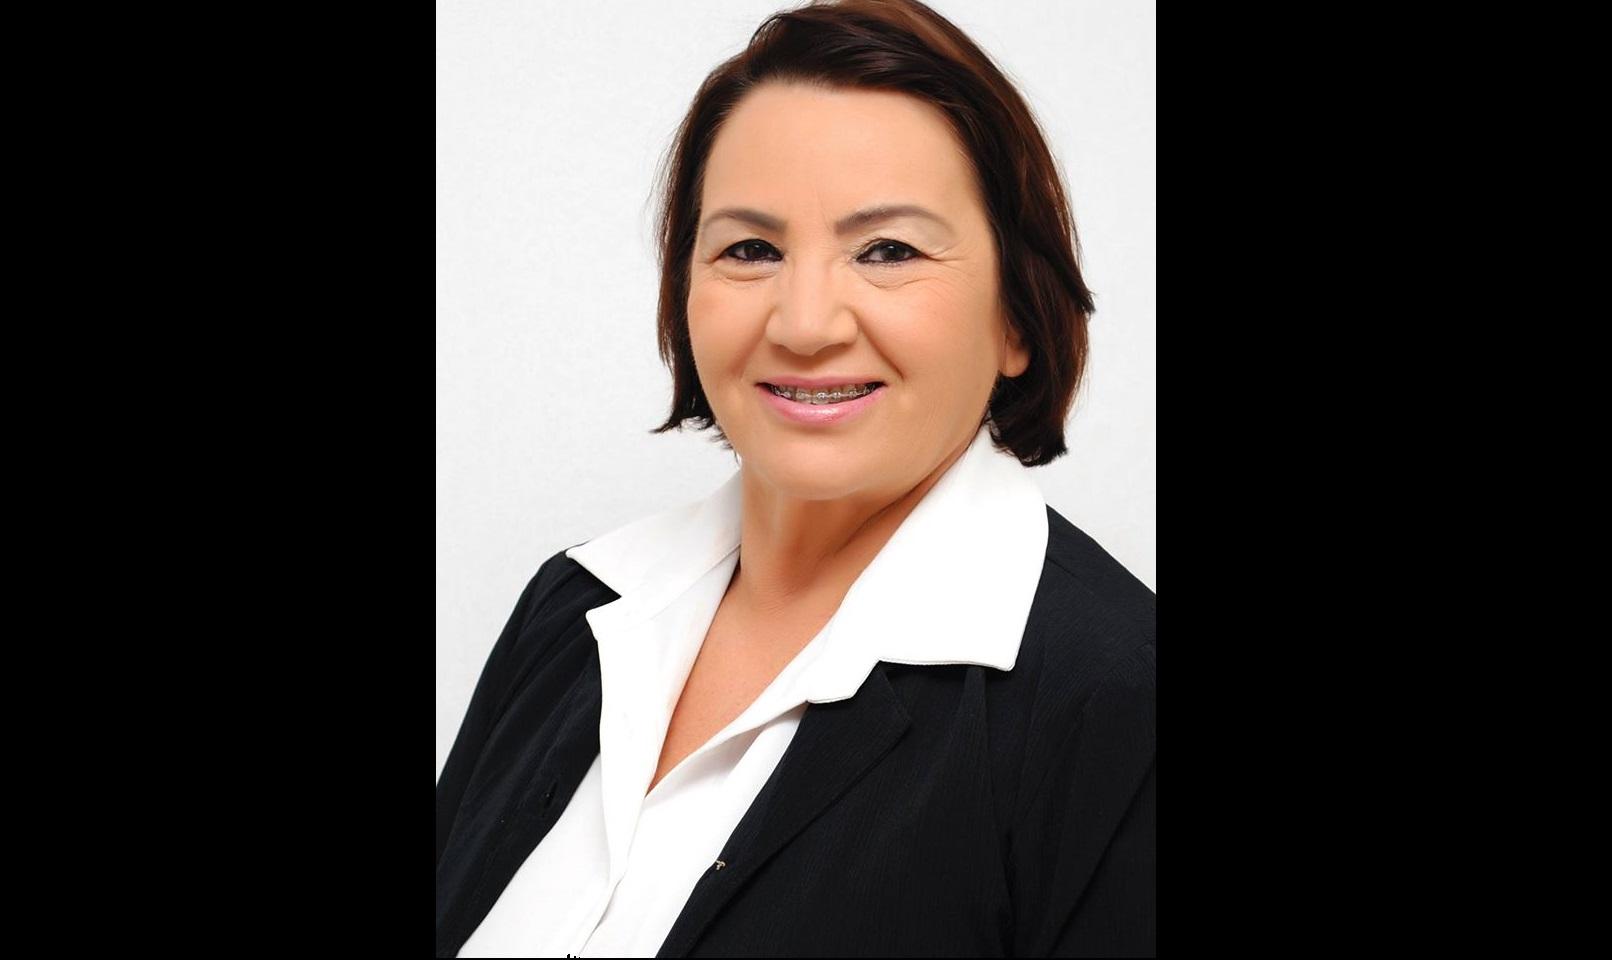 Profª. Otani Maria Noleto é eleita presidente da APAE de Guaraí e assume mandato a partir de 2020